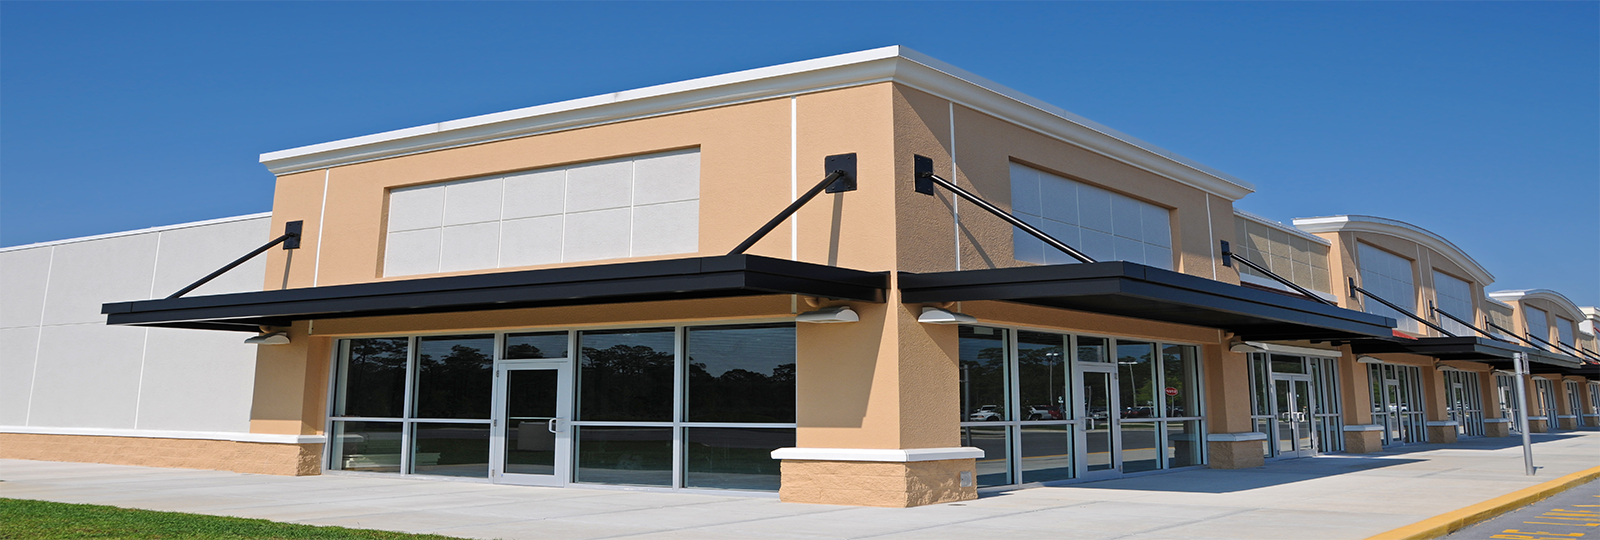 Asset Management Retail Solutions Advisors Asset